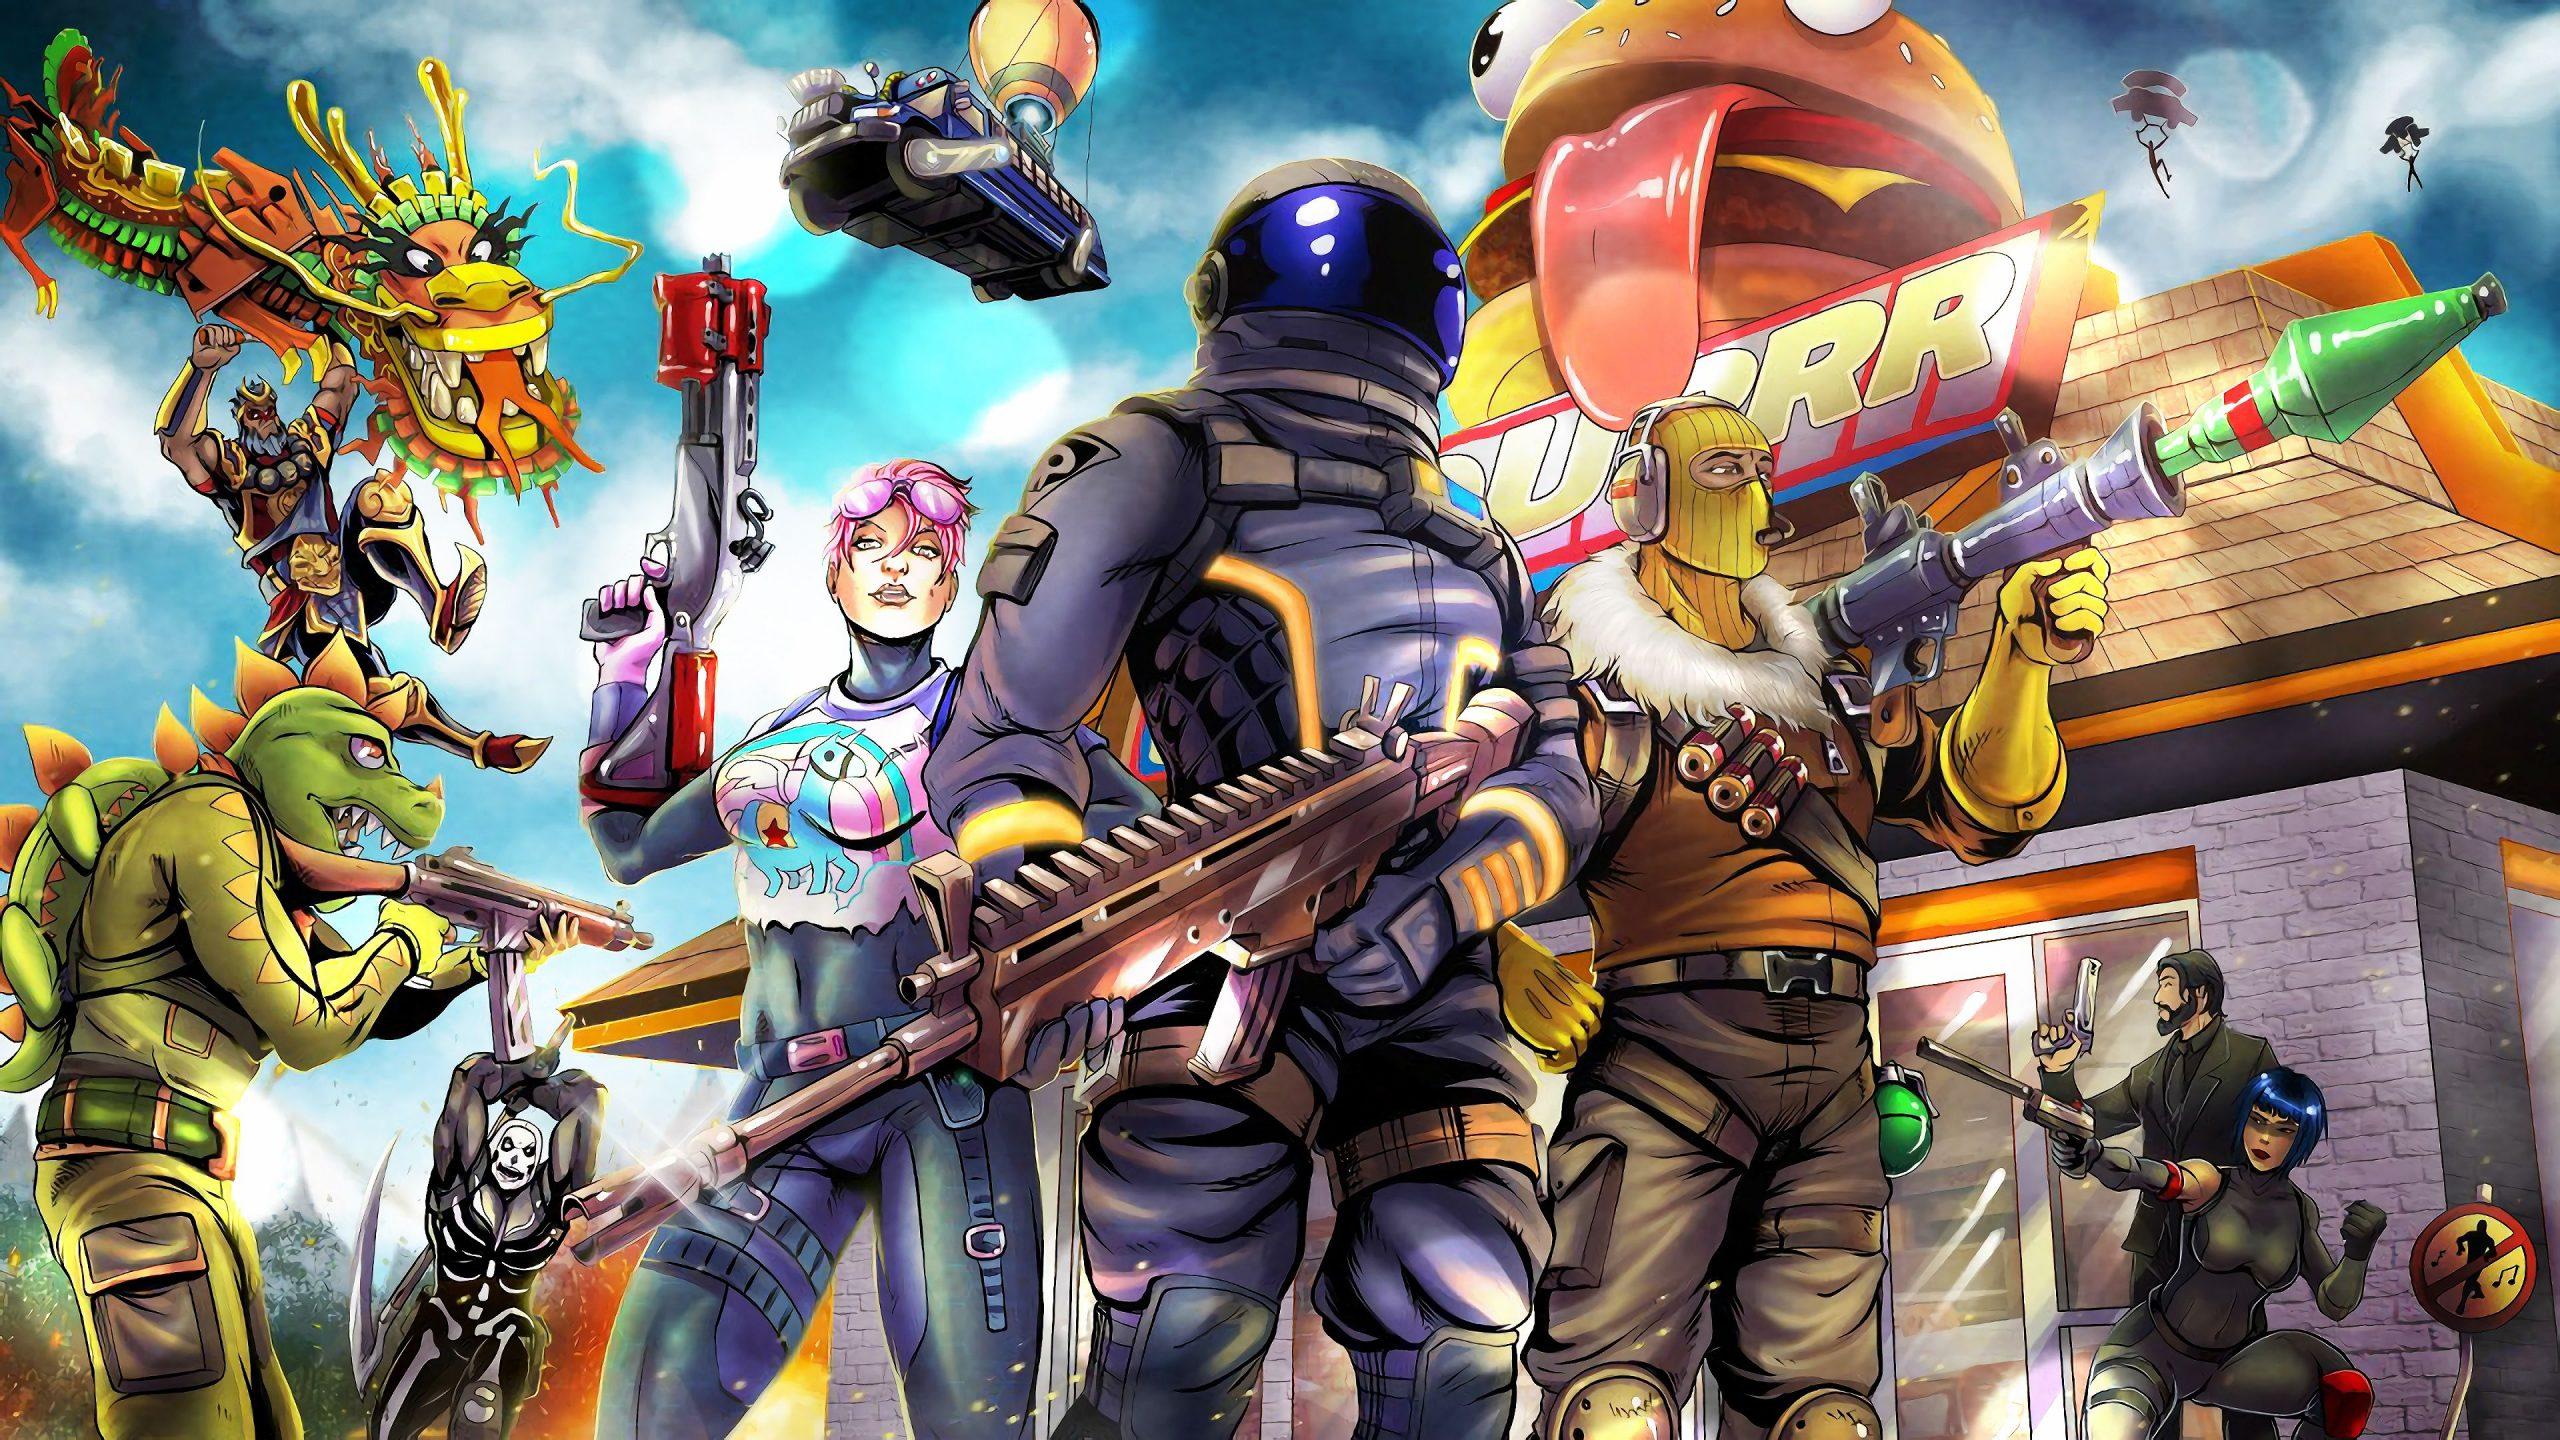 Epic Games تحميل برنامج المثبث الرسمي للعبة Fortnite